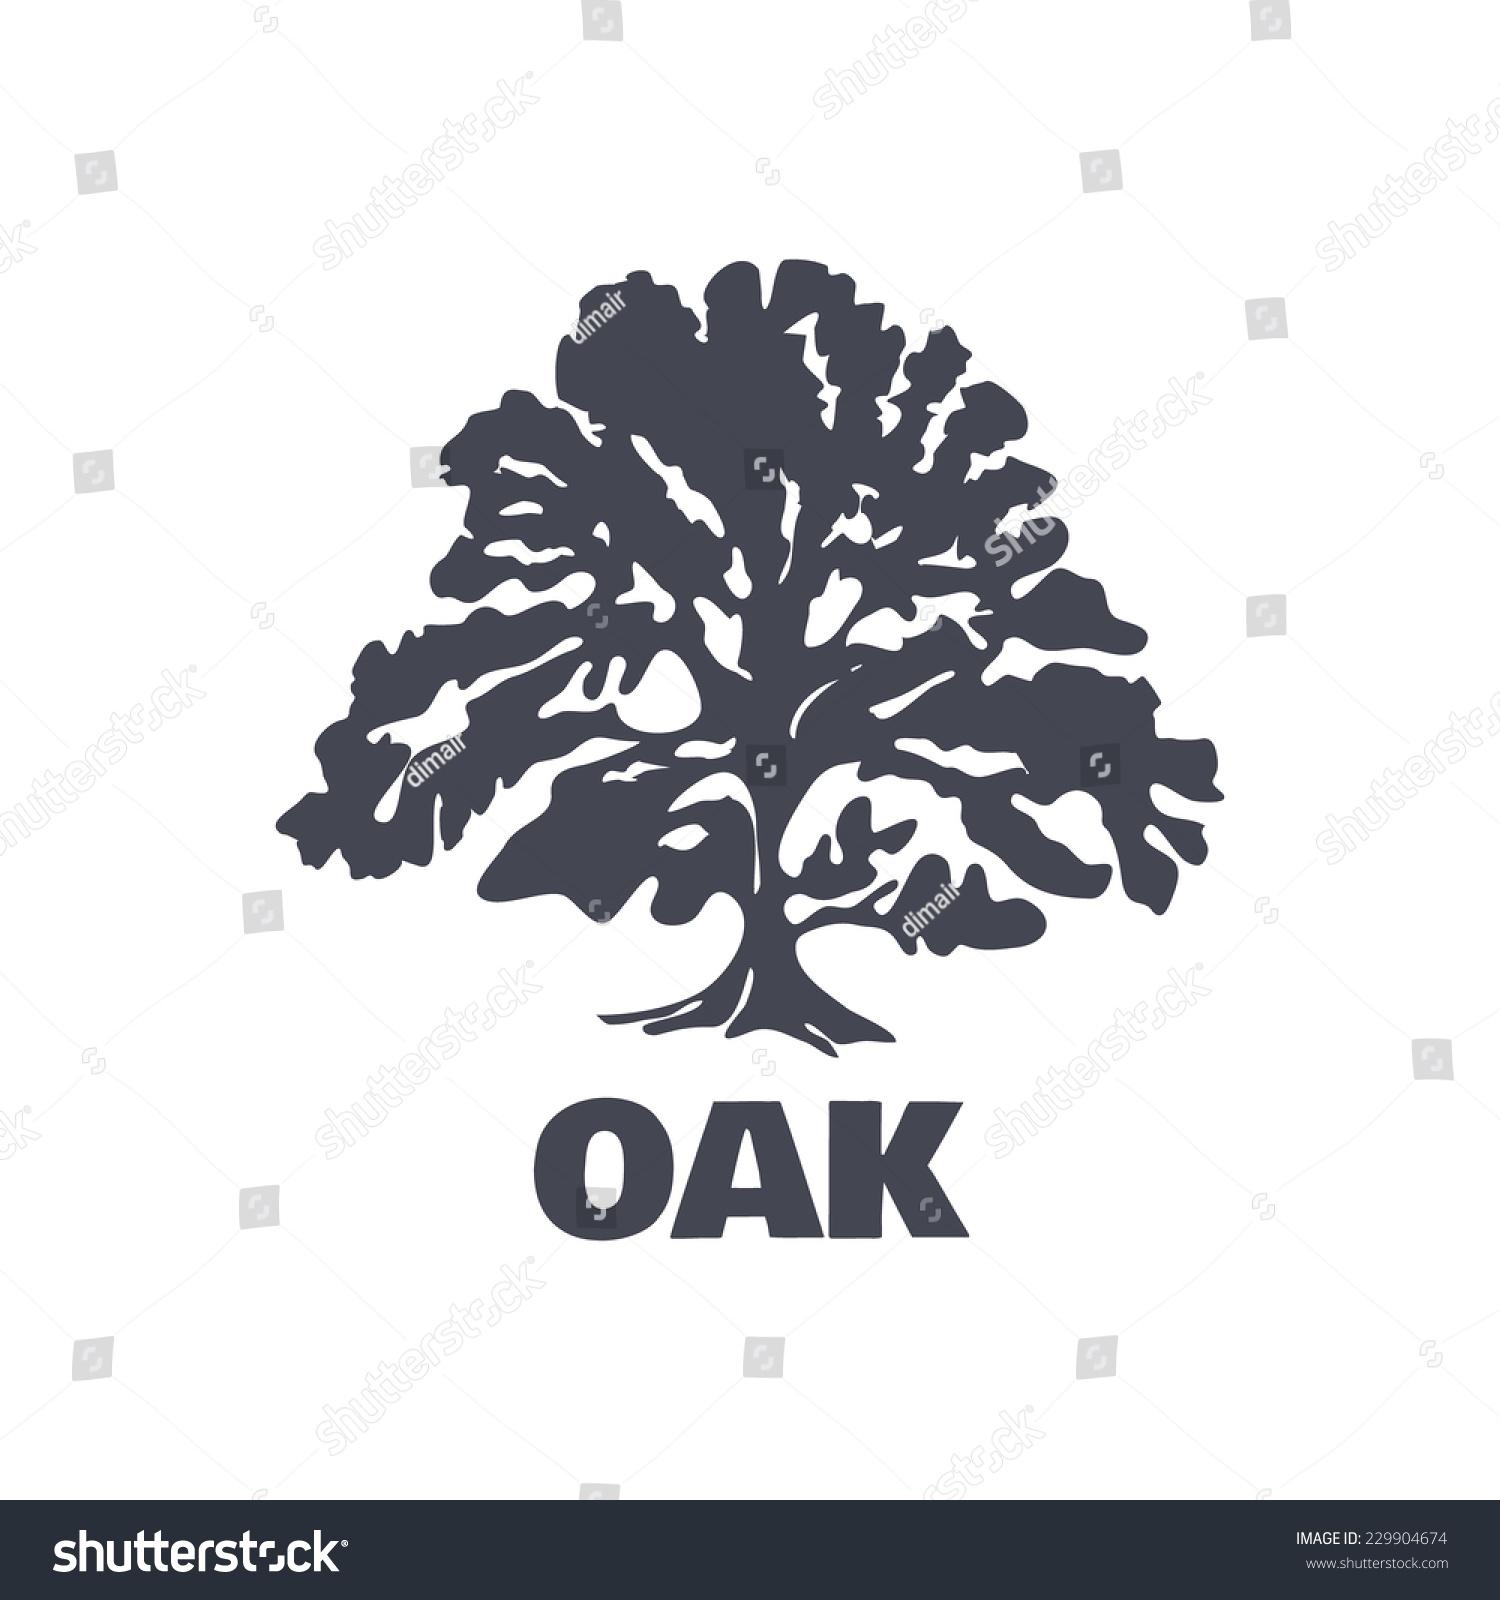 Oak Tree Logo Silhouette Isolated Vector Stock Vector 229904674 ...